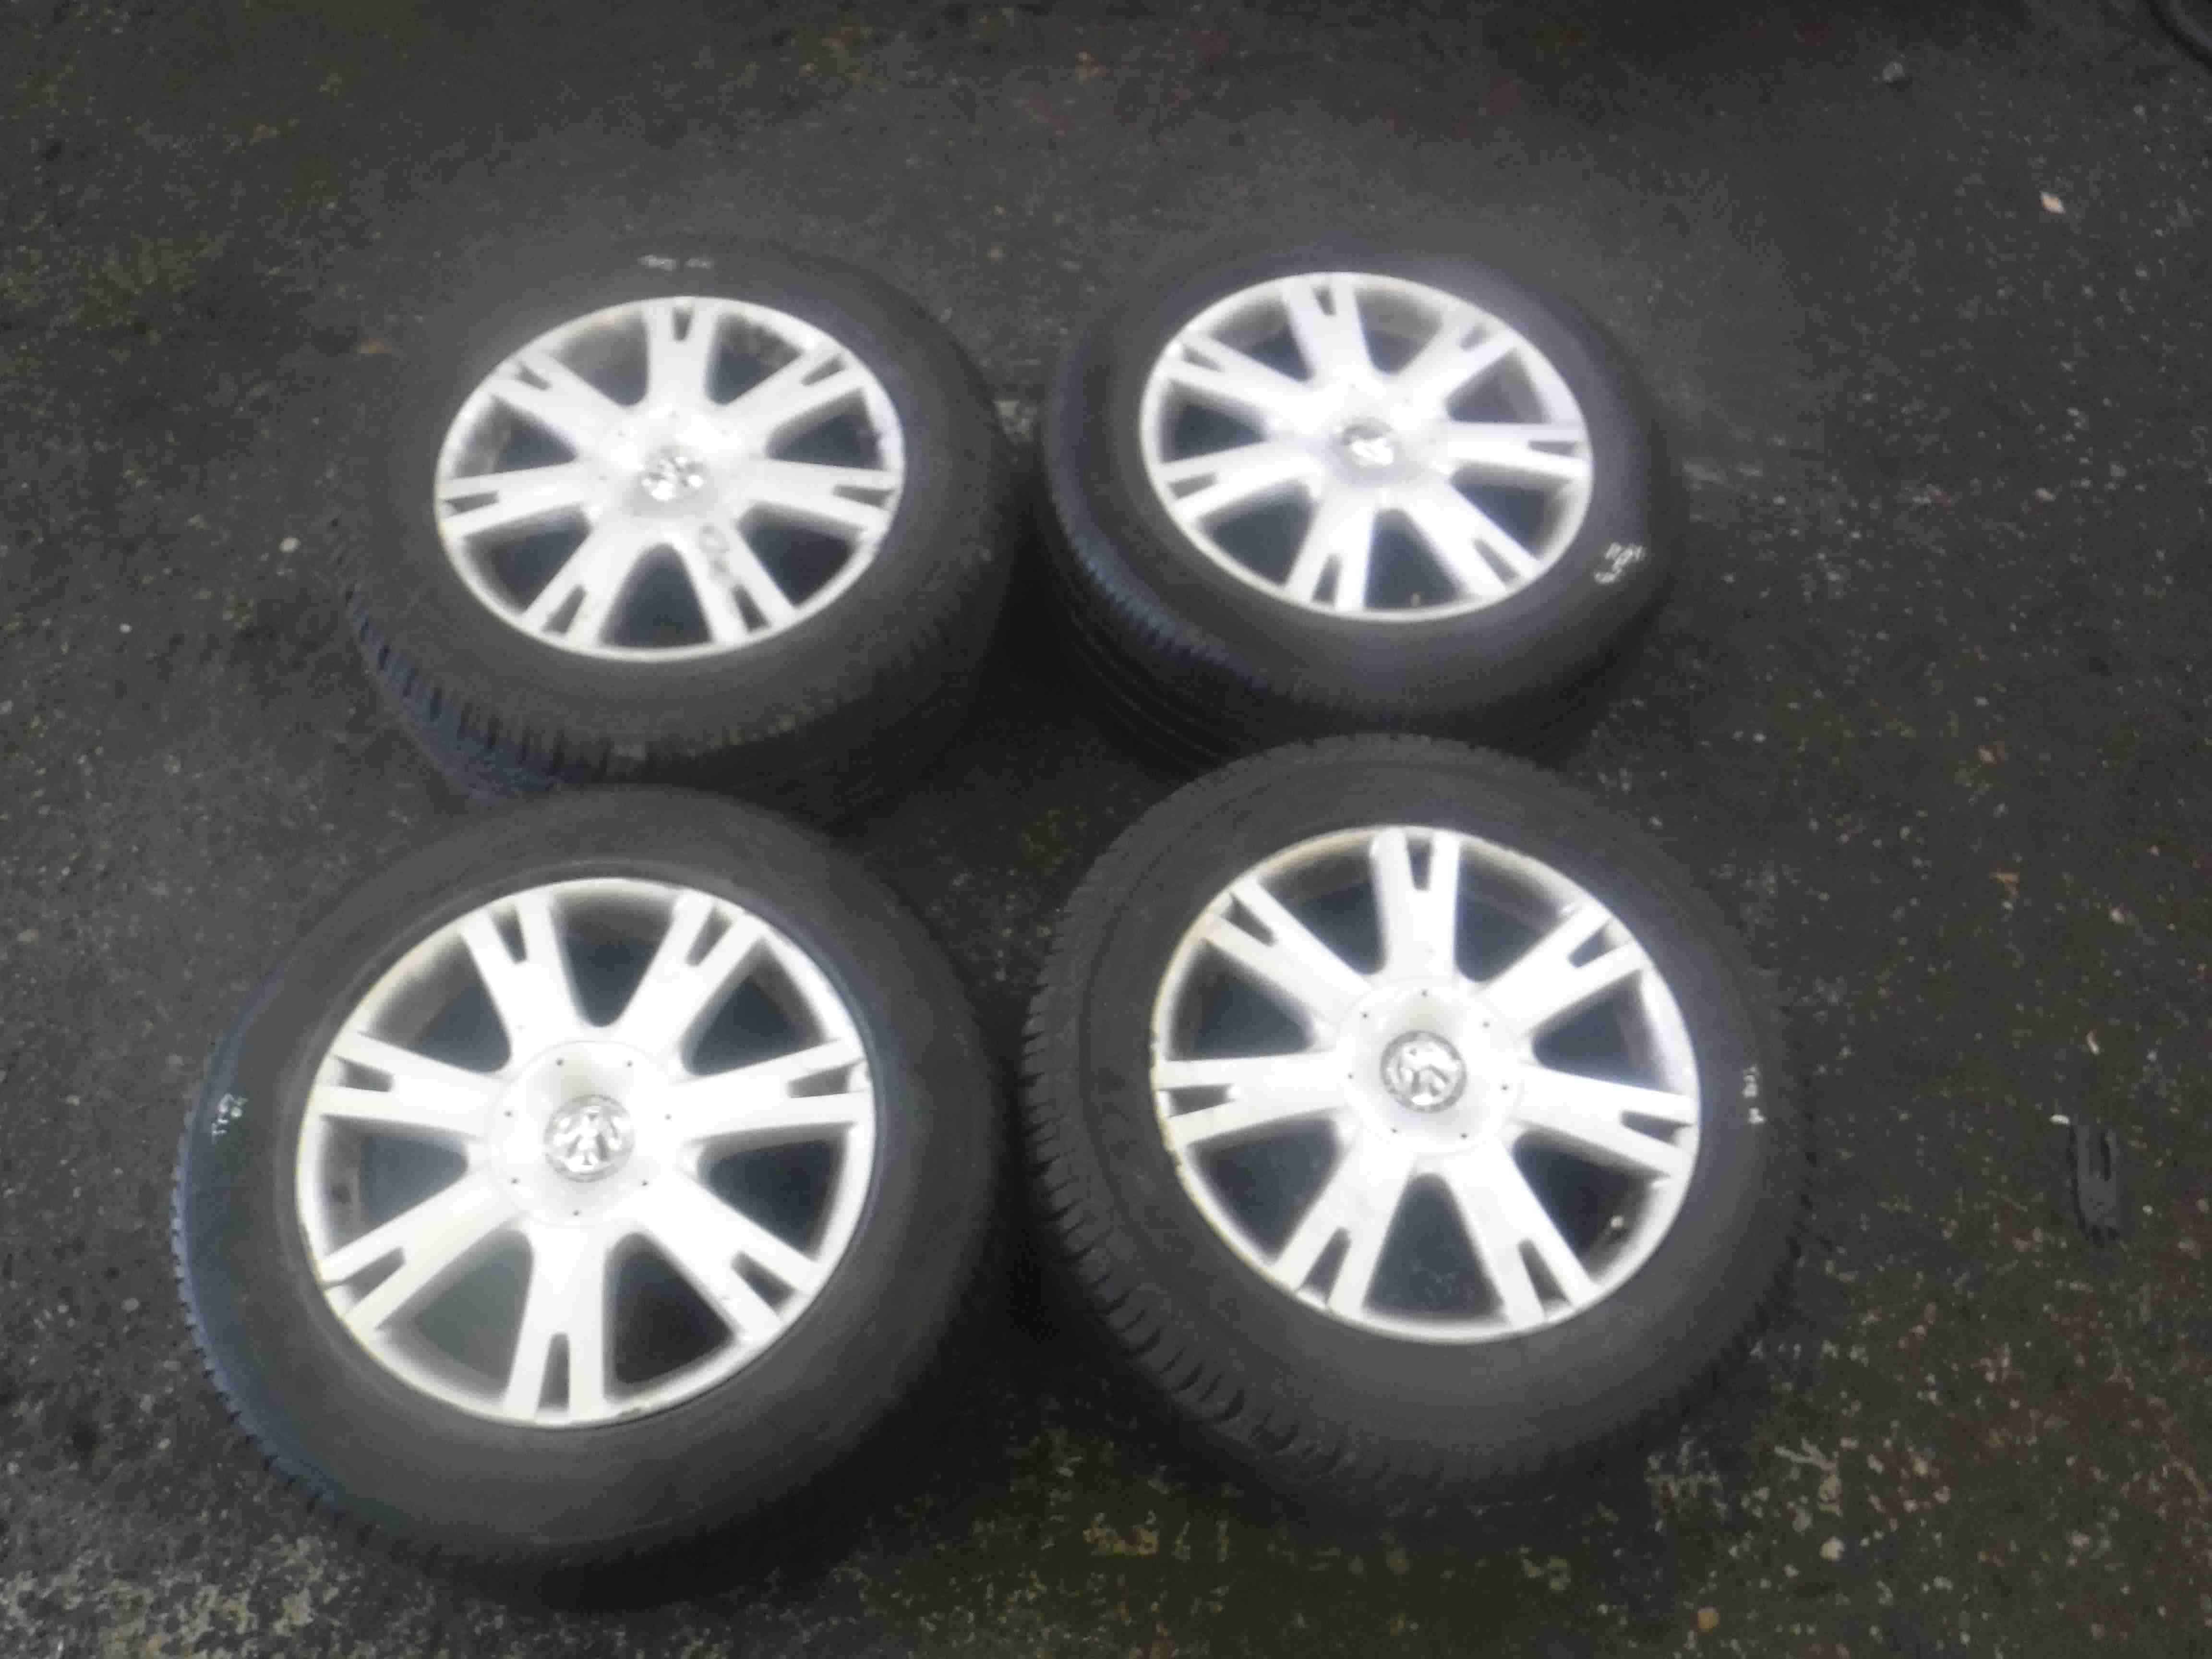 Volkswagen Touareg 2002-2007 Alloy Wheels Set X4 + Tyre 255 55 18 18inch 3/5